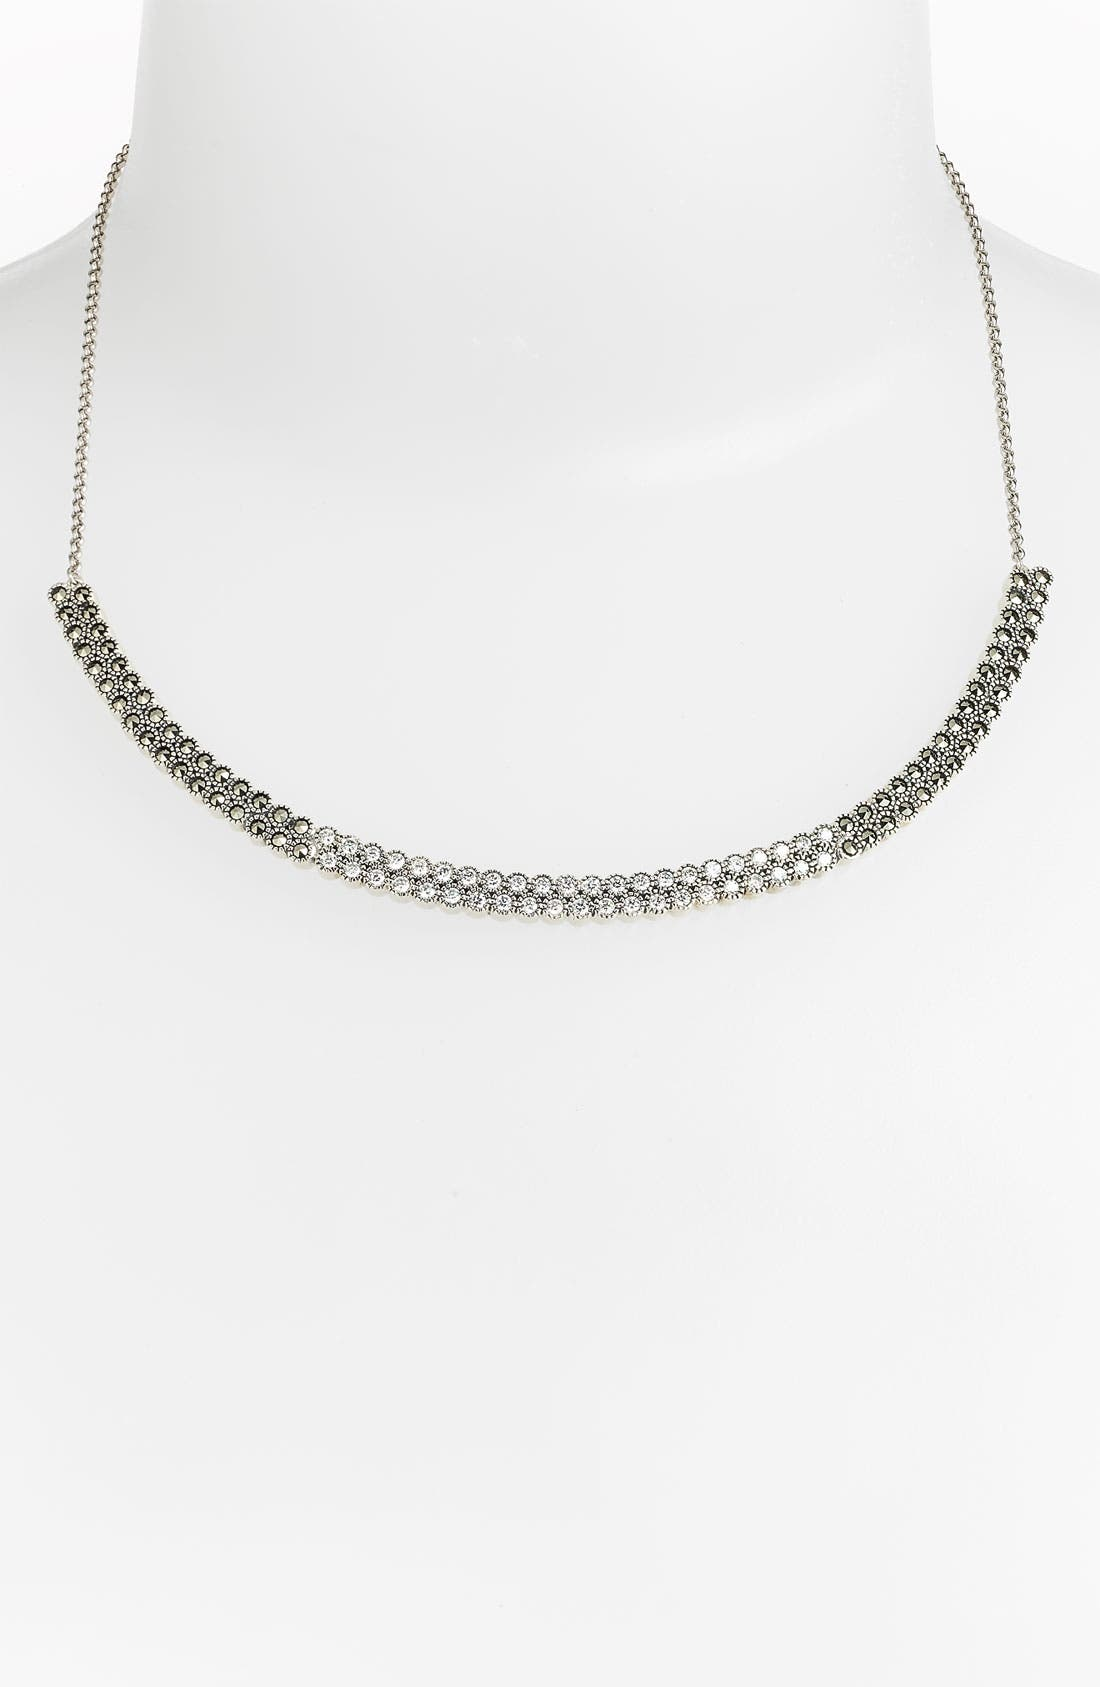 Main Image - Judith Jack 'Starlight' Collar Necklace